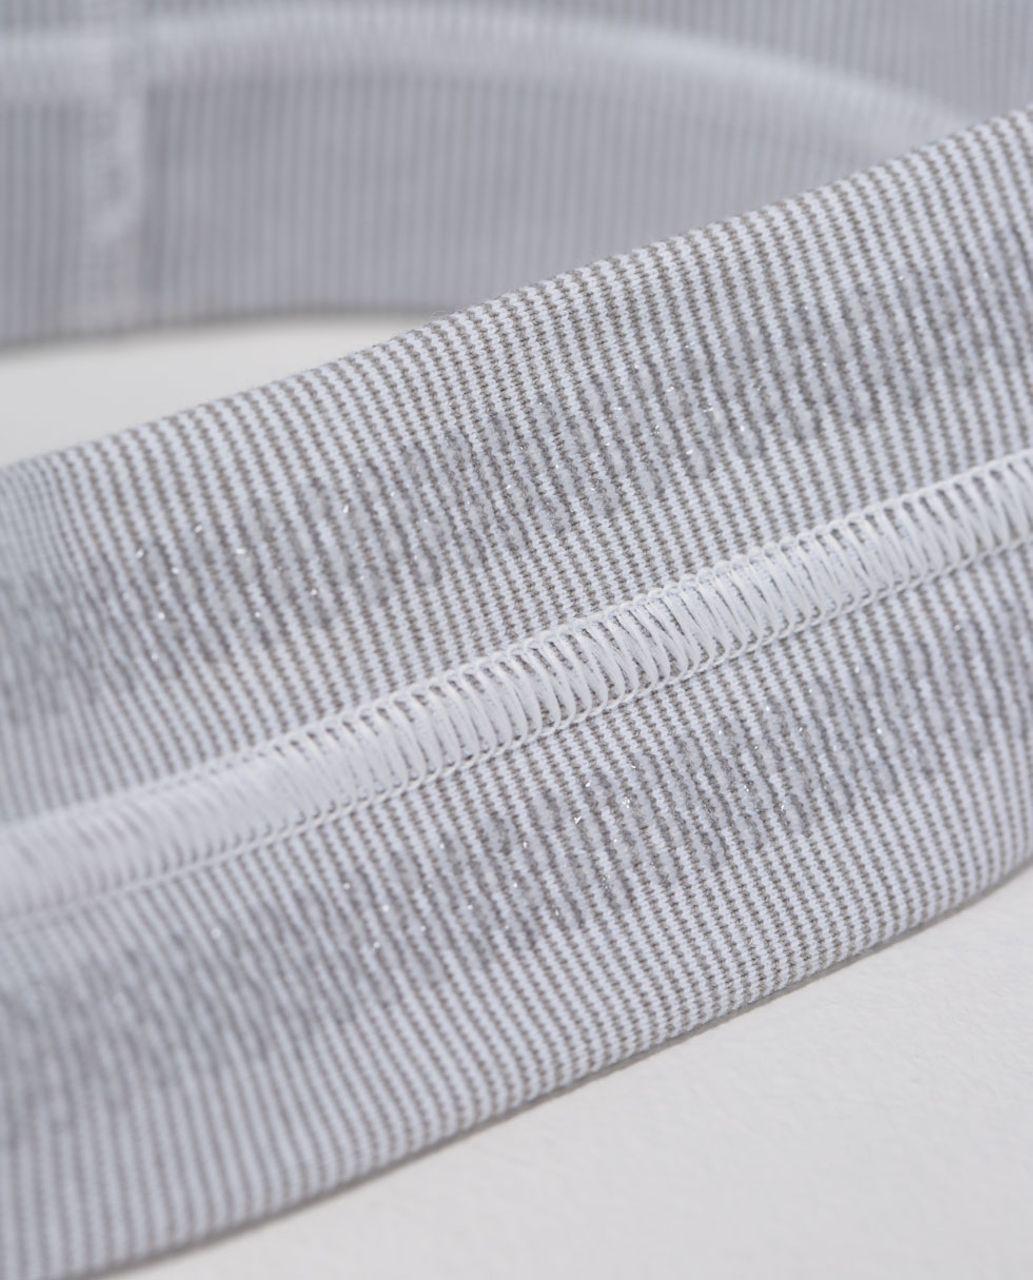 Lululemon Fly Away Tamer Headband - Wee Stripe White Heathered Medium Grey